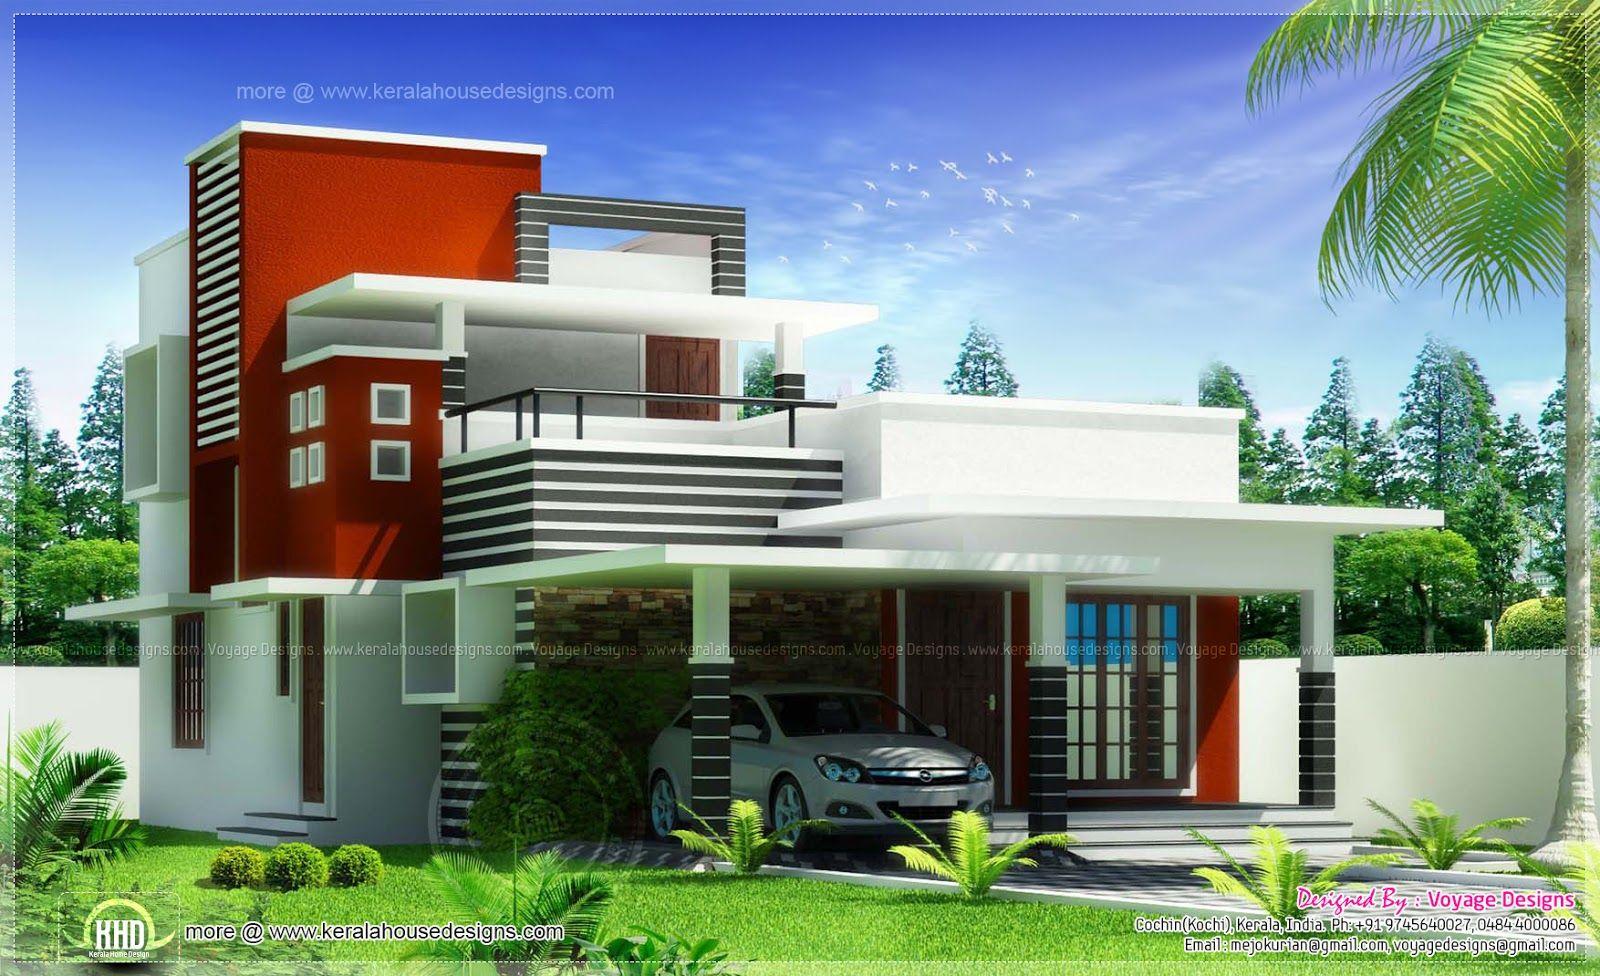 Kerala house designs  Architecture  Pinterest  Kerala